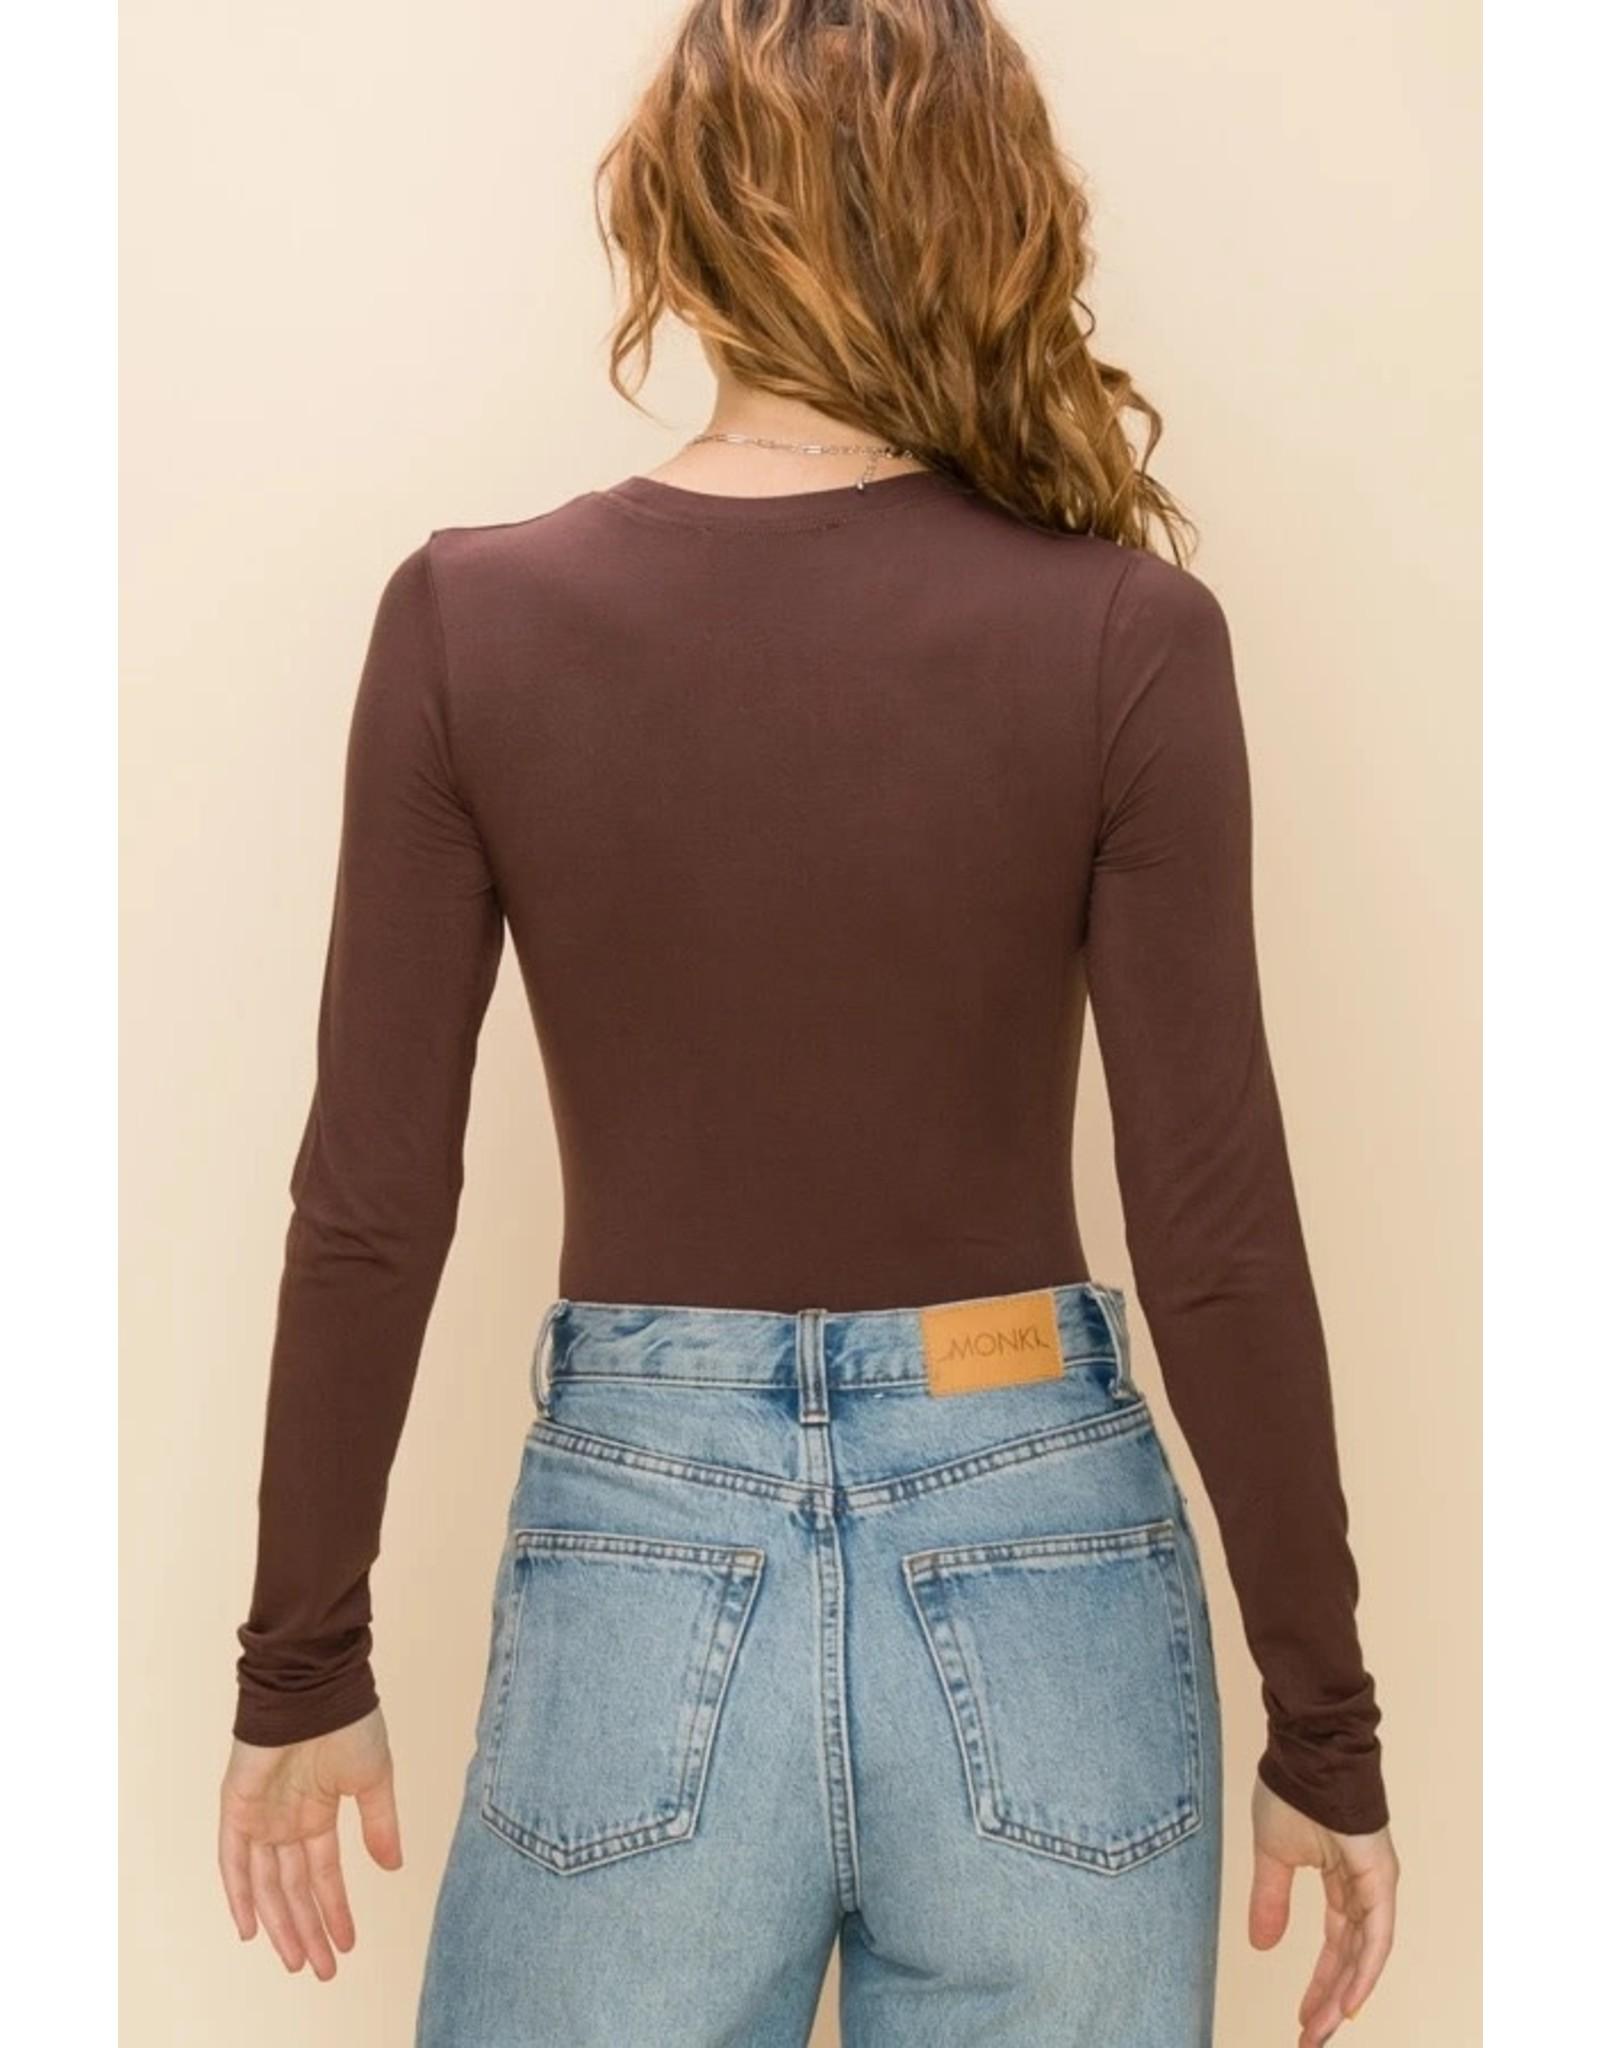 BONNIE Brown Long Sleeve Bodysuit